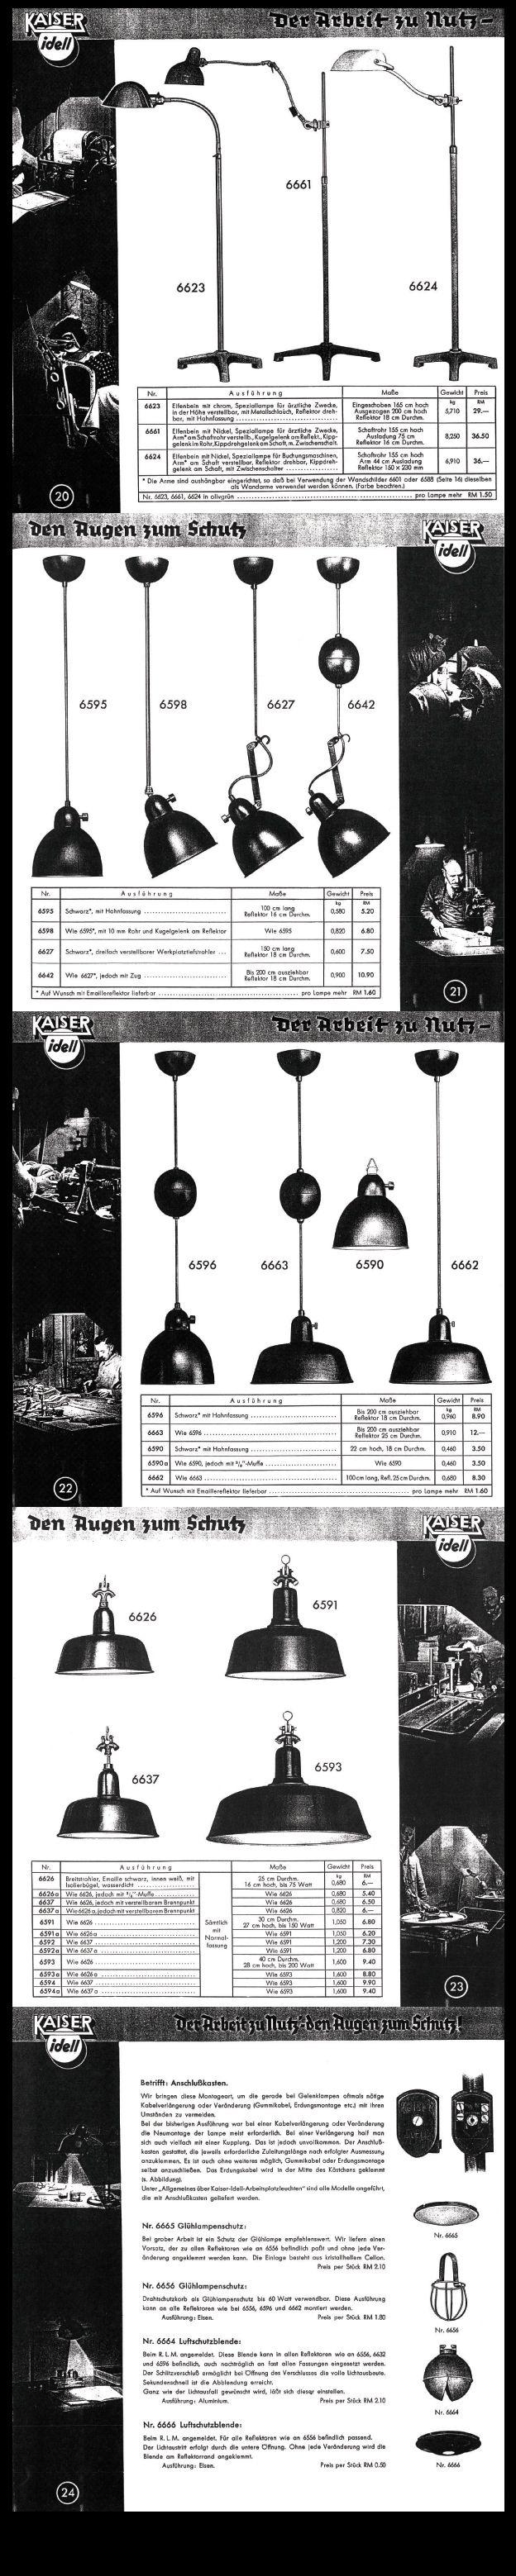 Rare Kaiser & Co. Work Lamp Catalogue 1936 - Pages 20 to 24 #KaiserIdell #Kaiser #Idell #ChristianDell #Bauhaus #Modernism #Modernist #molecula